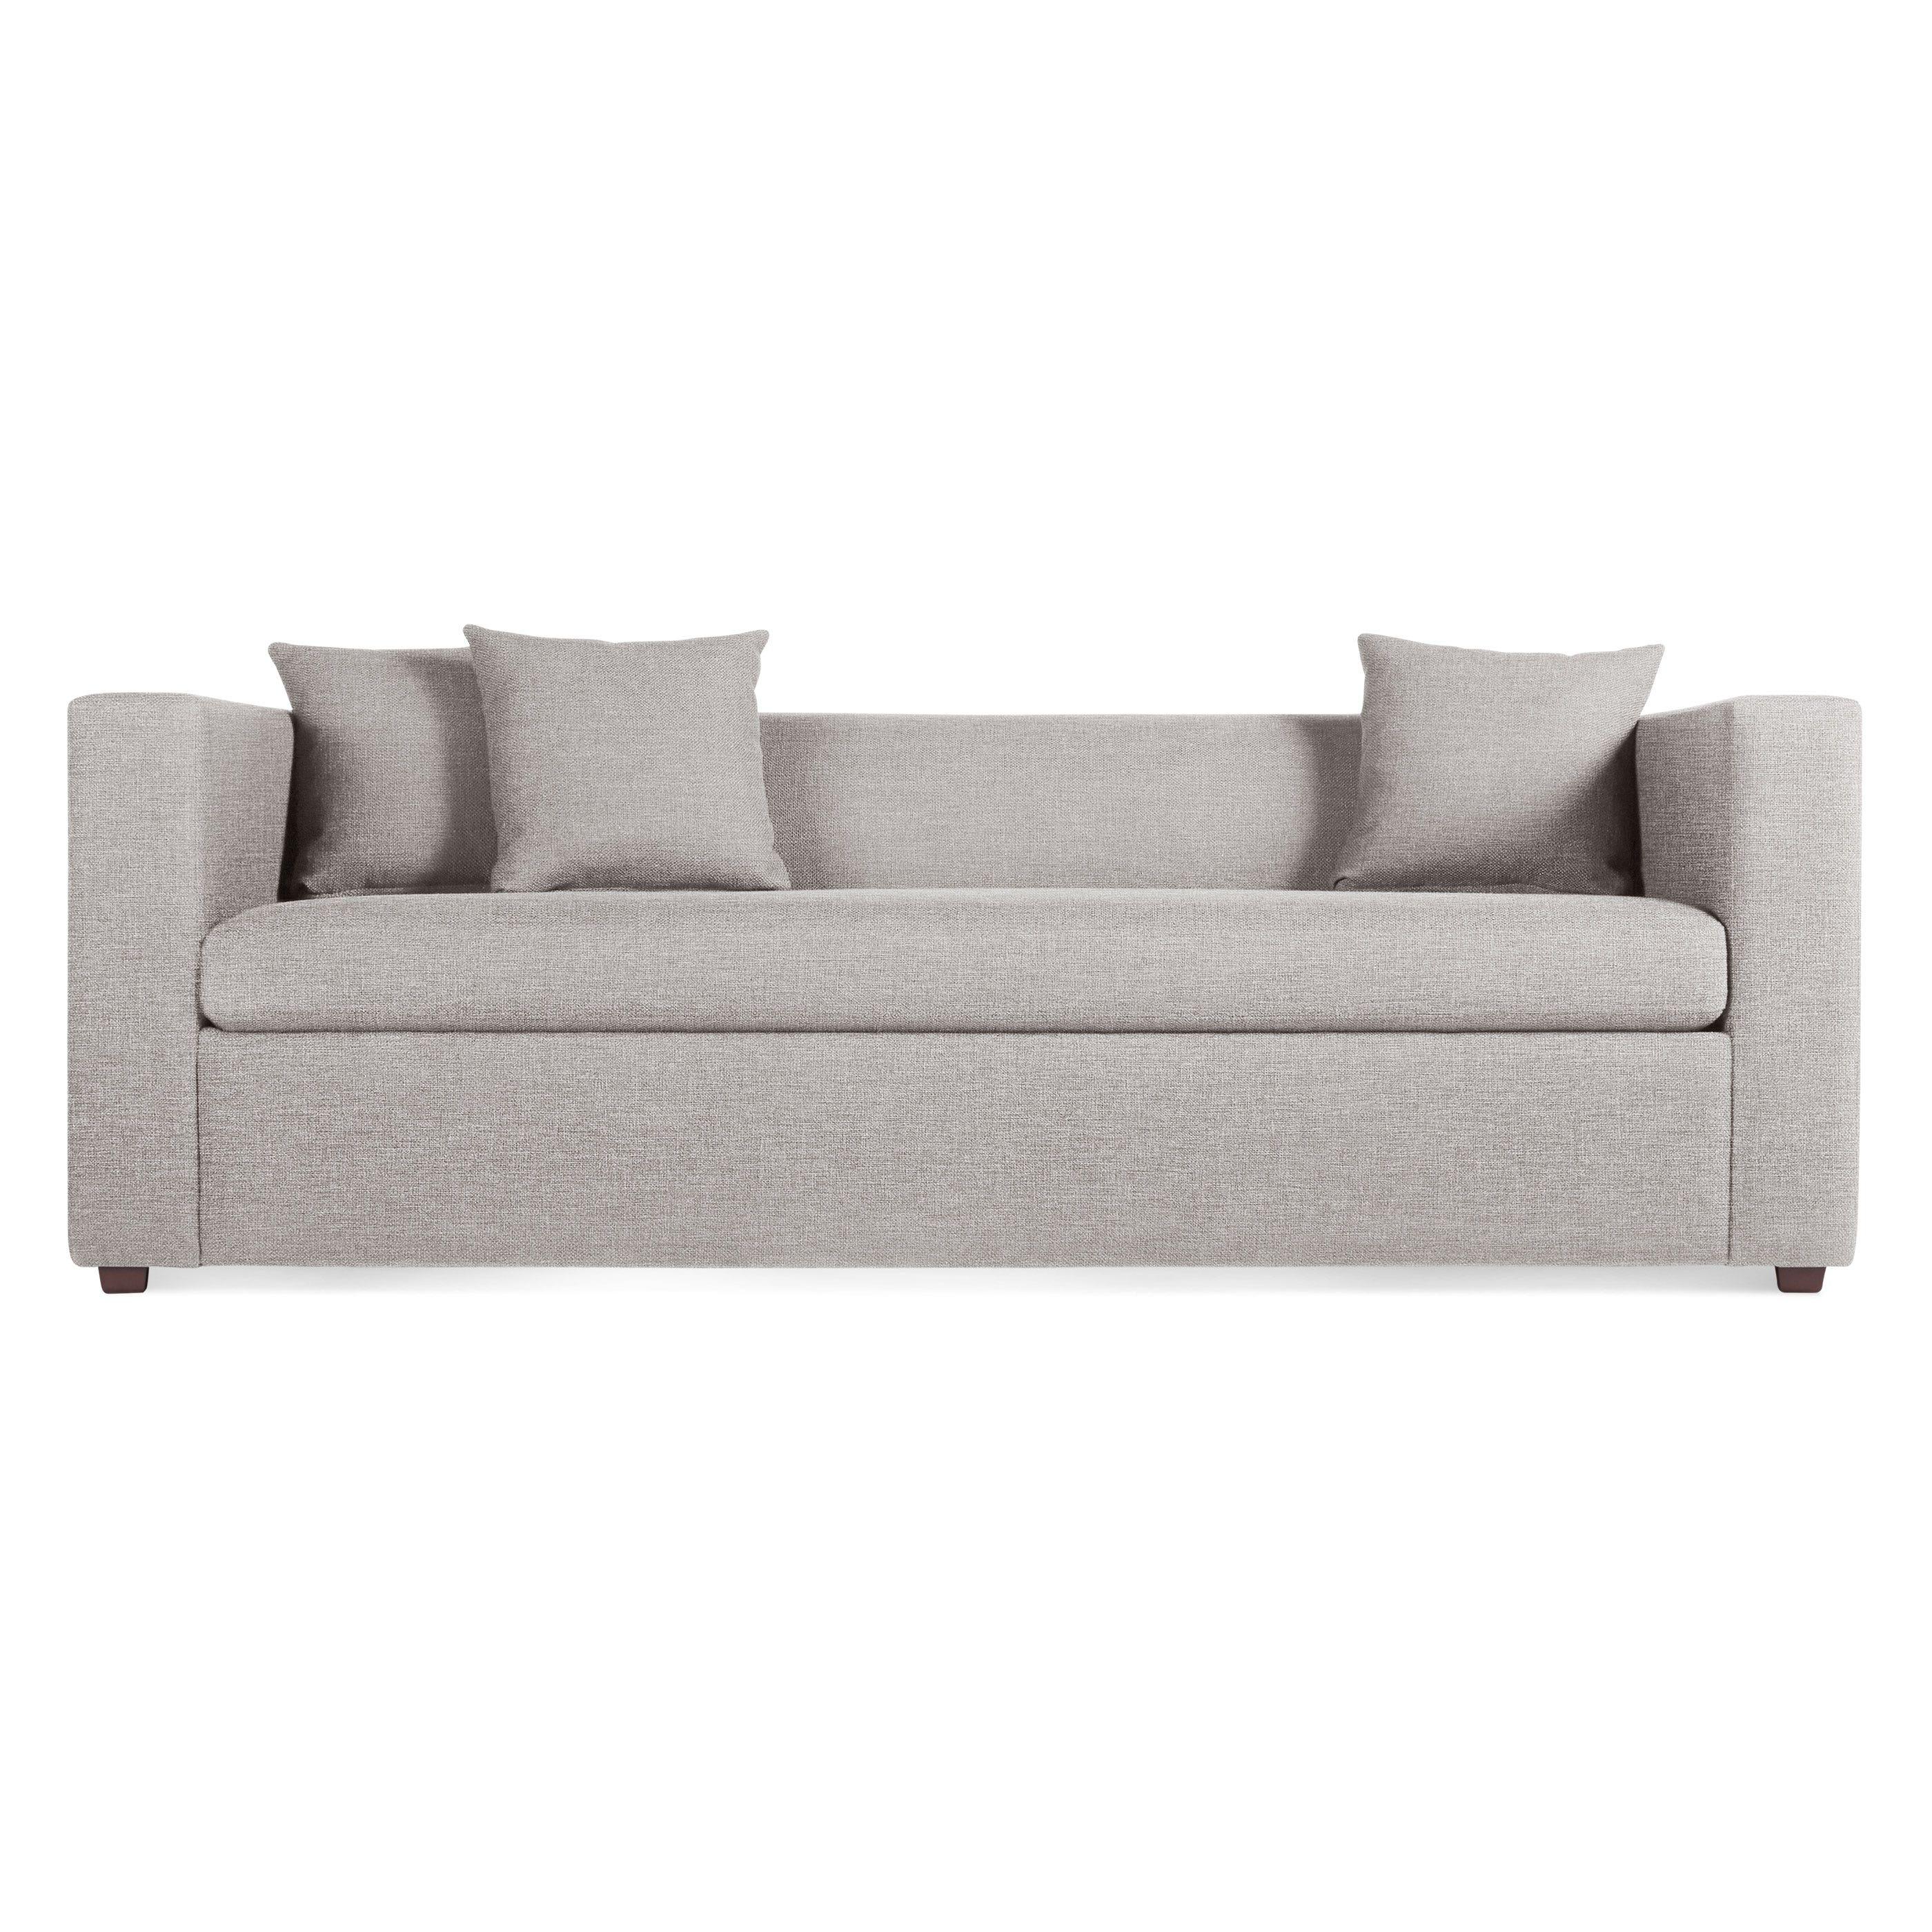 - Mono Modern Sleeper Sofa - Modern Sofas & Sleepers - Blu Dot